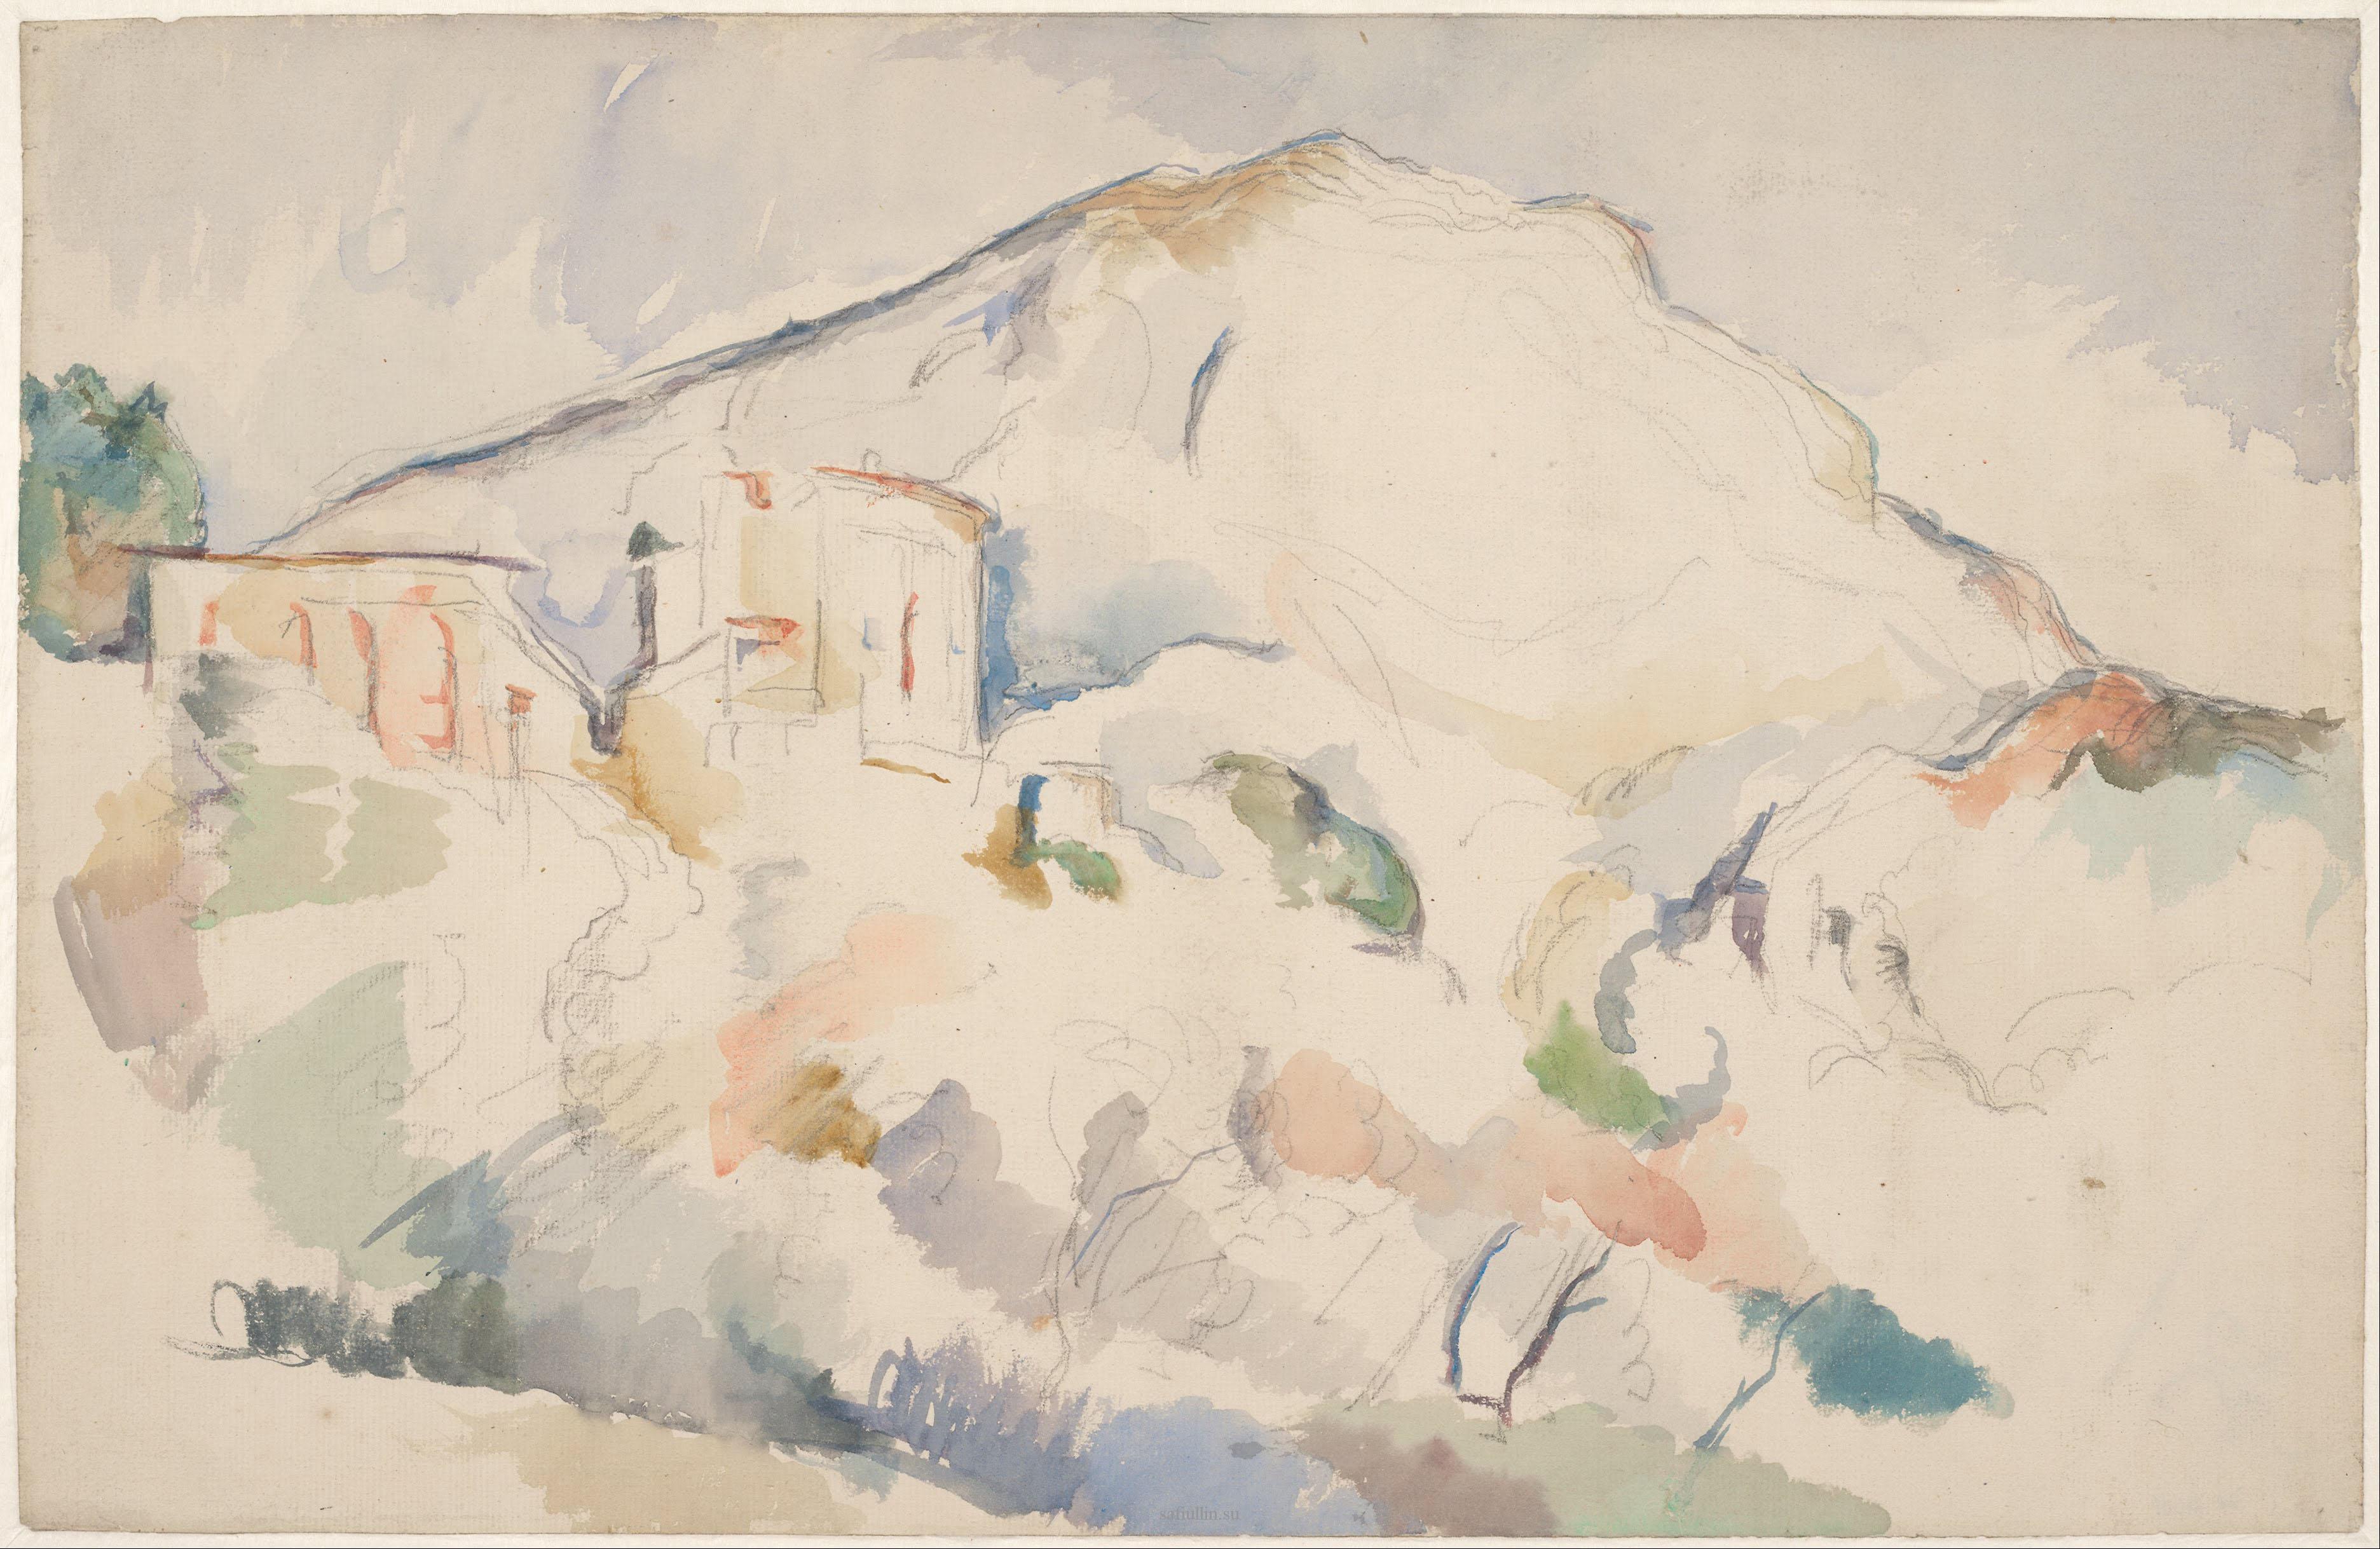 Сезанн рисунок Mountain Sainte-Victoire пейзажи природы Сафиуллин акварель 1890